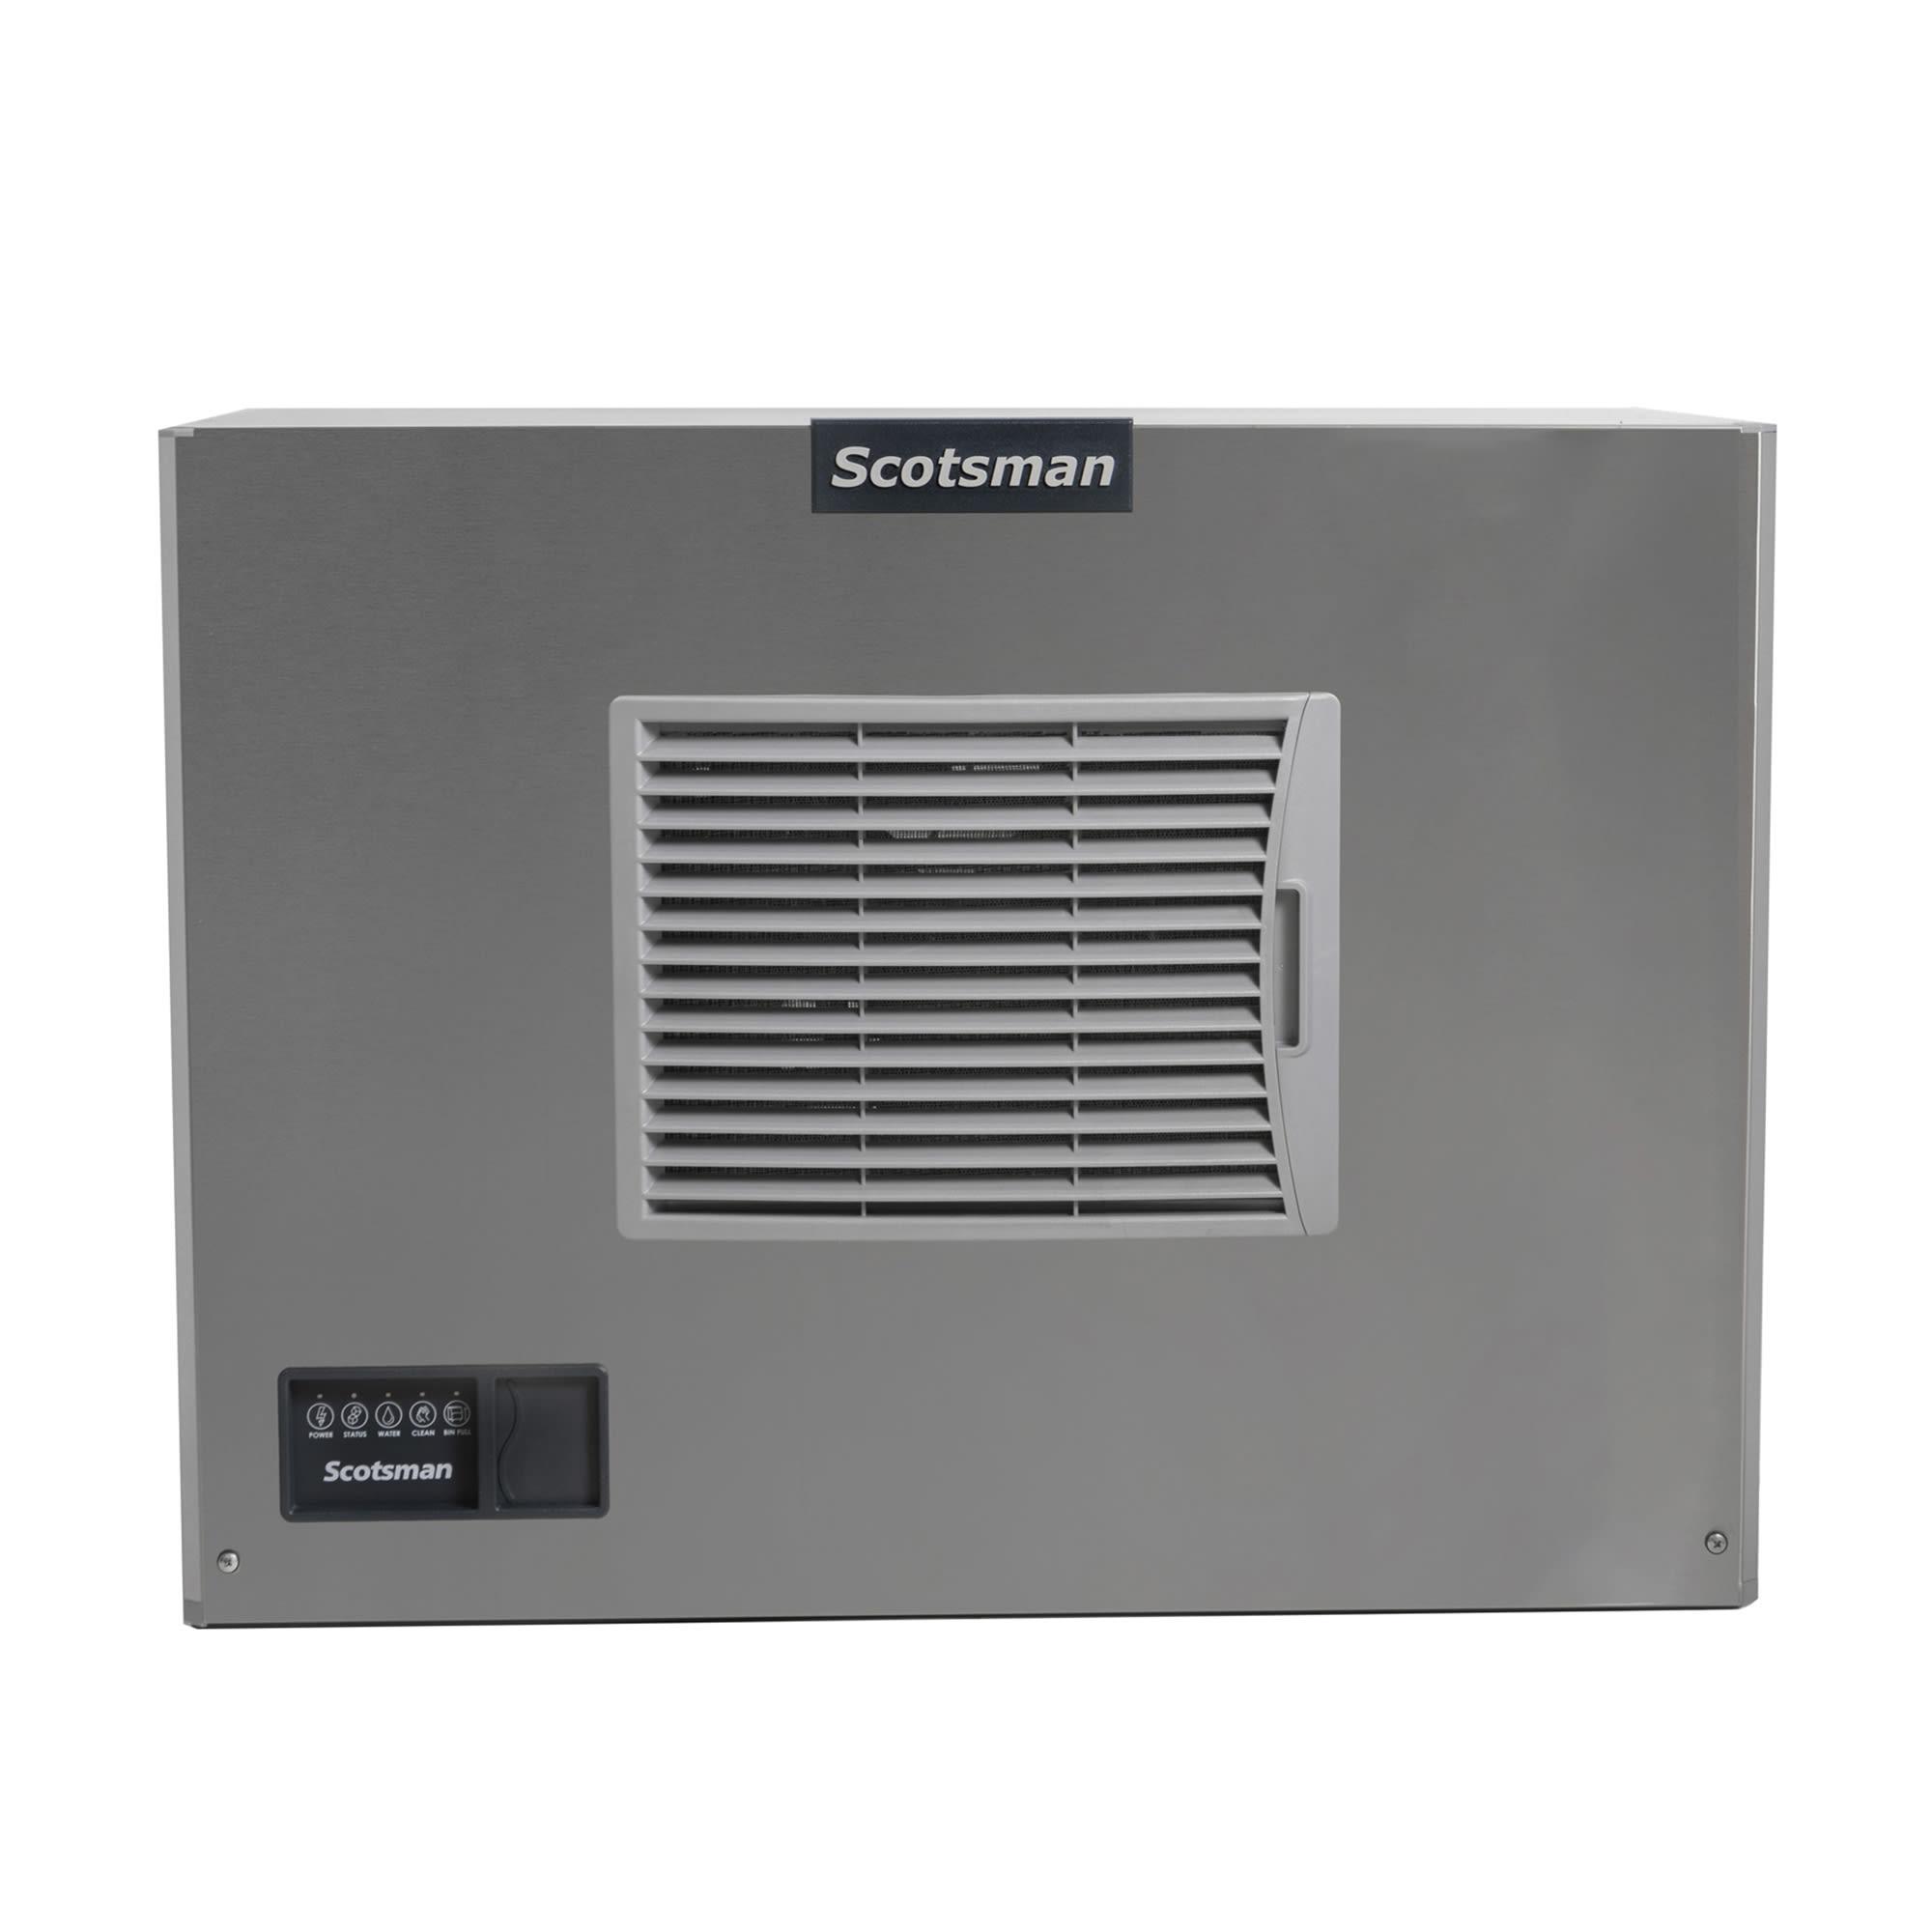 "Scotsman C0330MA-32 30"" Prodigy Plus® Full Cube Ice Machine Head - 400 lb/day, Air Cooled, 208/230v/1ph"